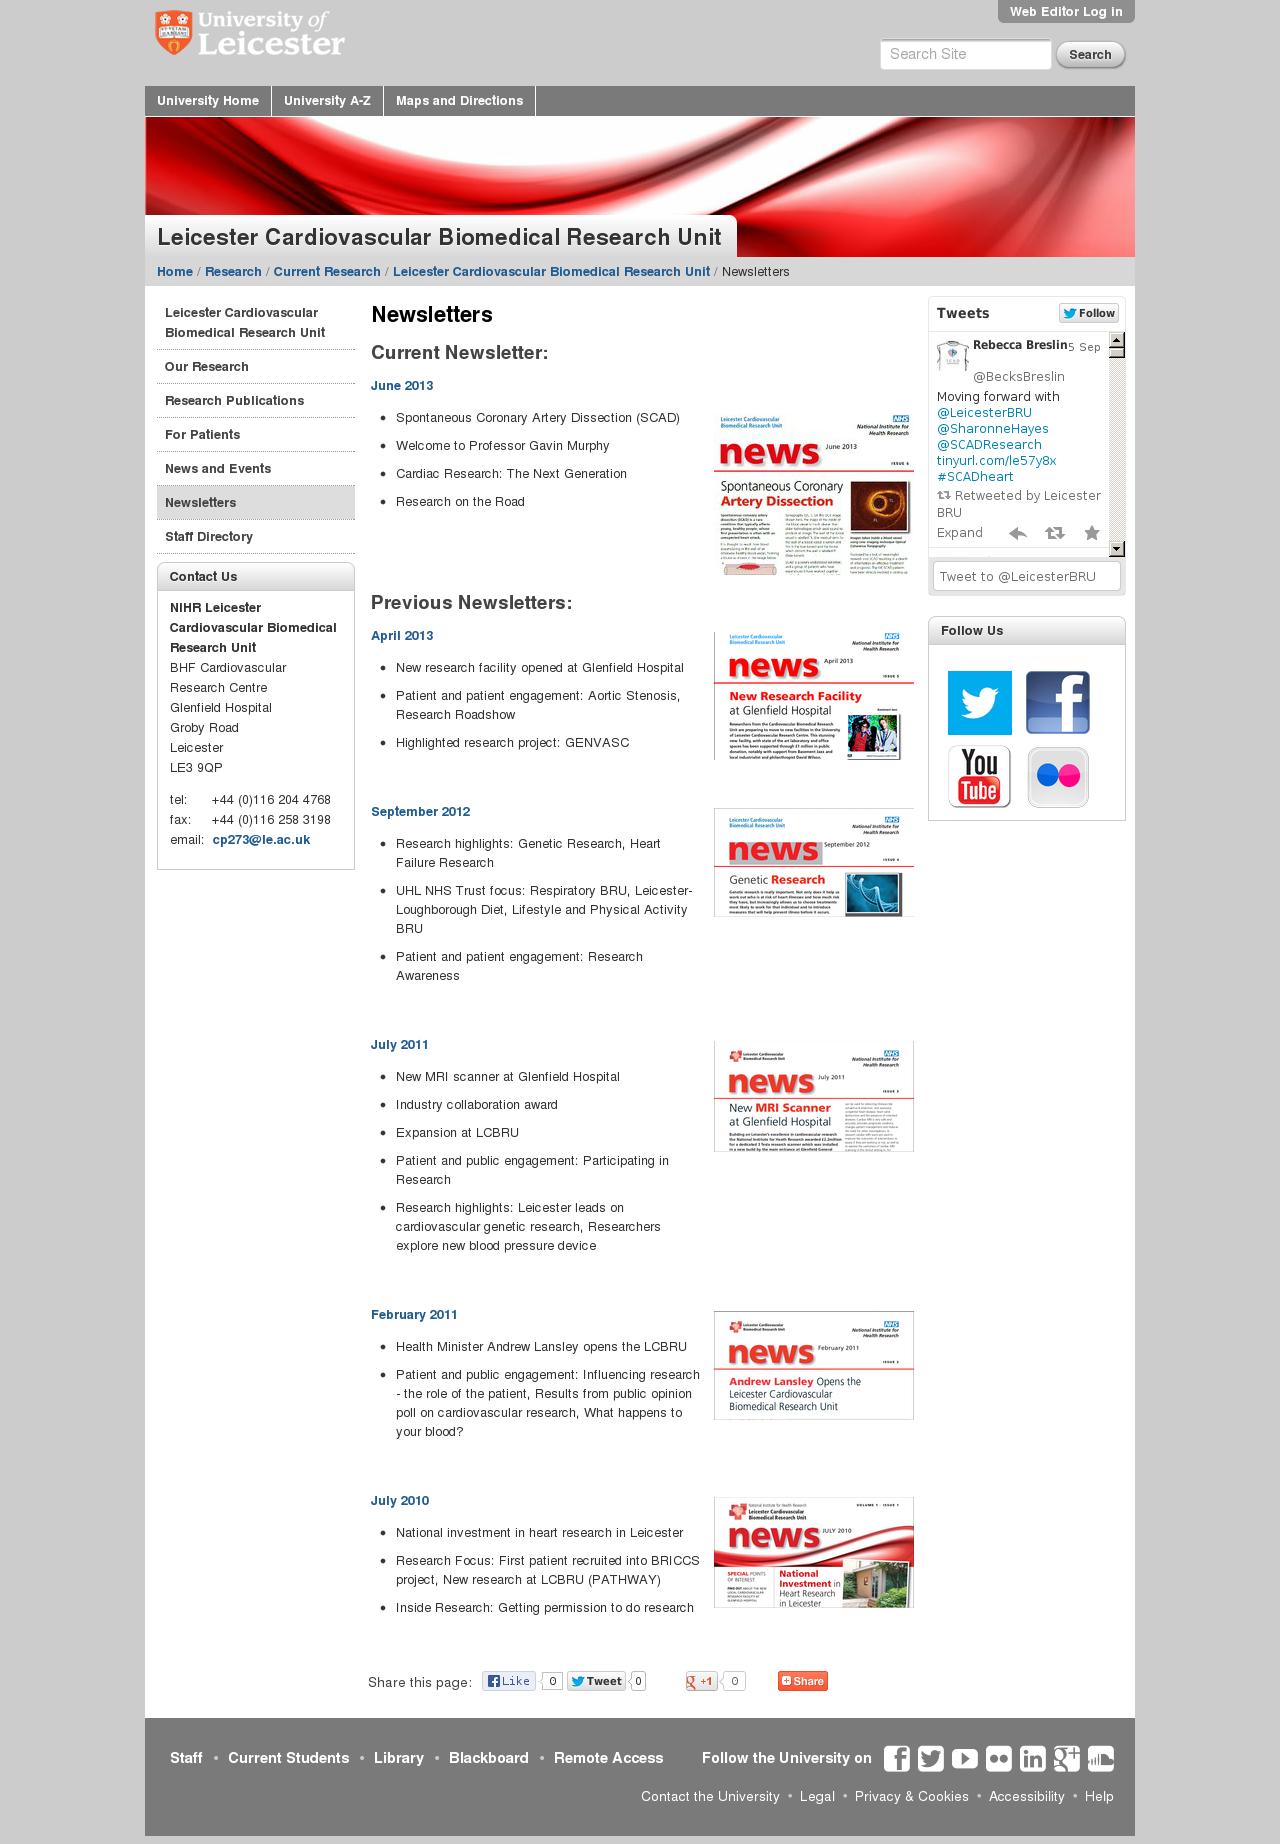 Website: Newsletters